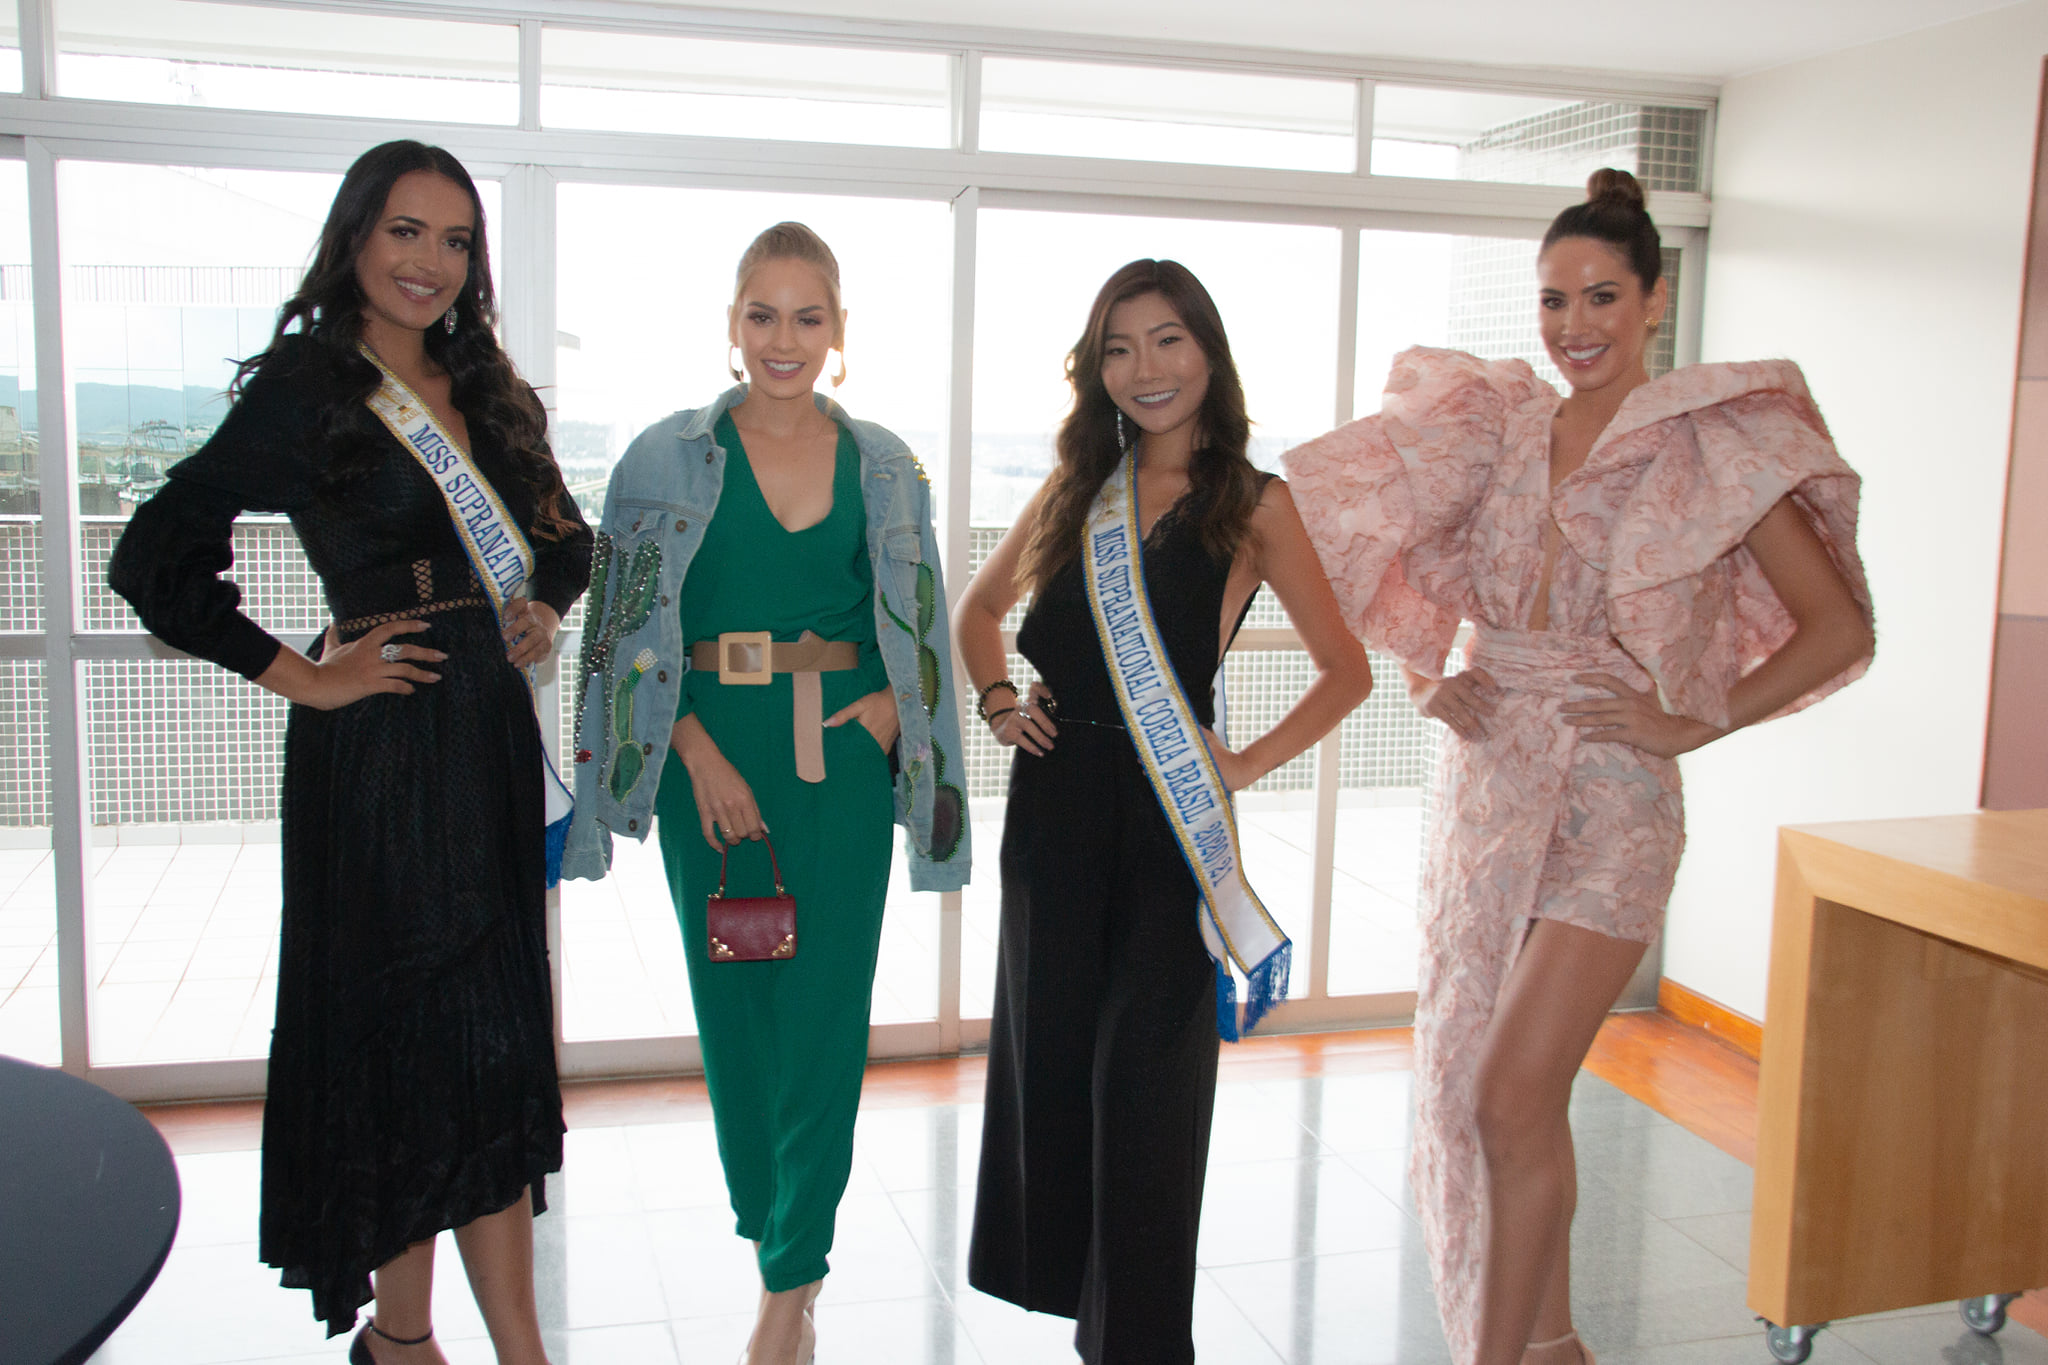 bruna zanardo, 1st runner-up de miss supranational brazil 2020/miss brasil internacional 2017/miss brasil terra 2016. - Página 17 12765510